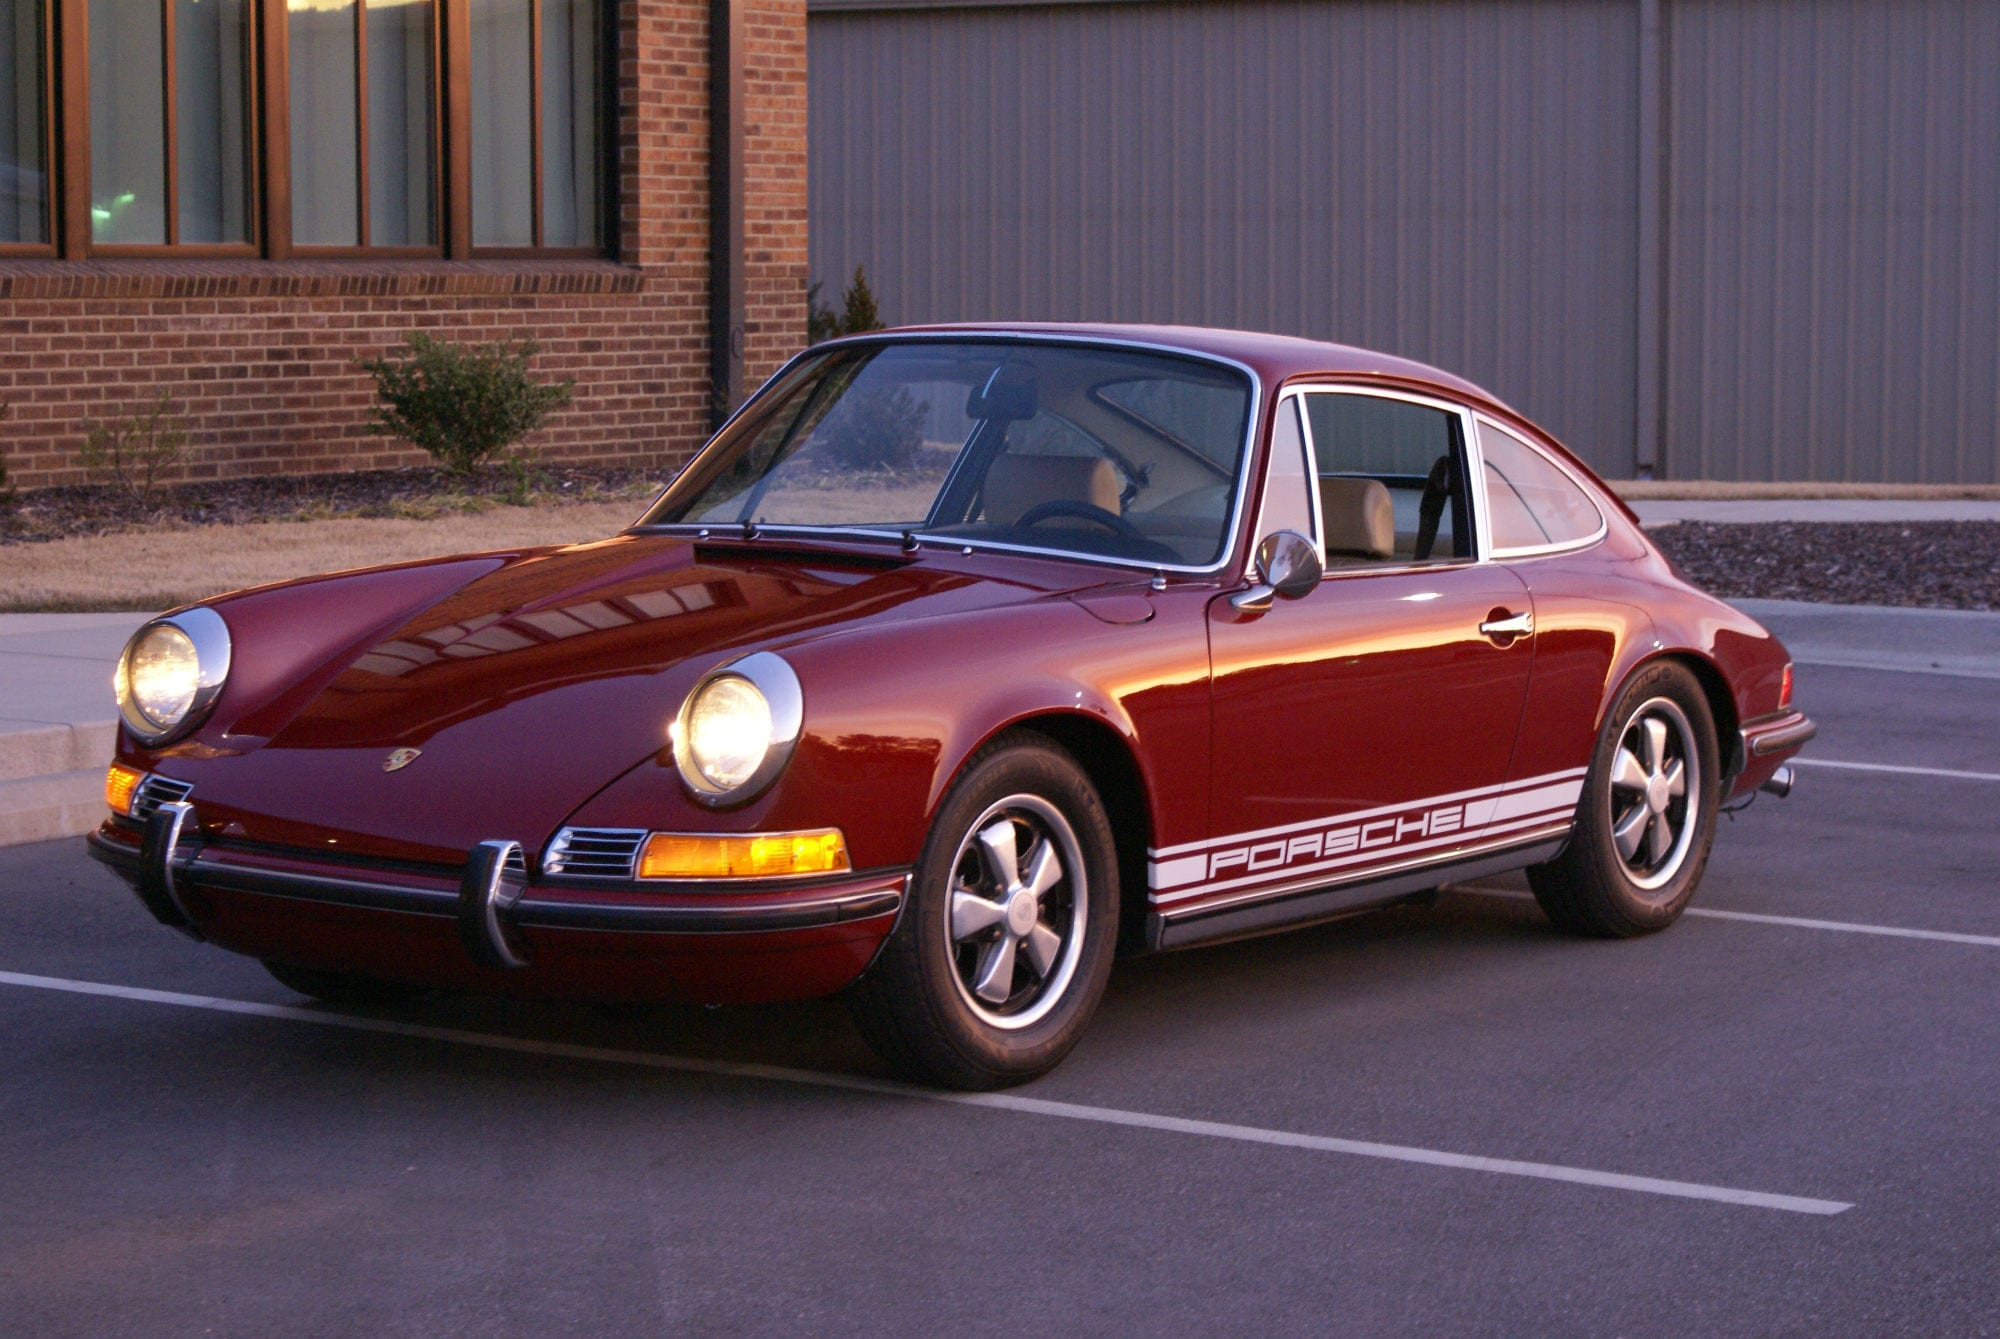 1969 Porsche 911T Serial #119100001